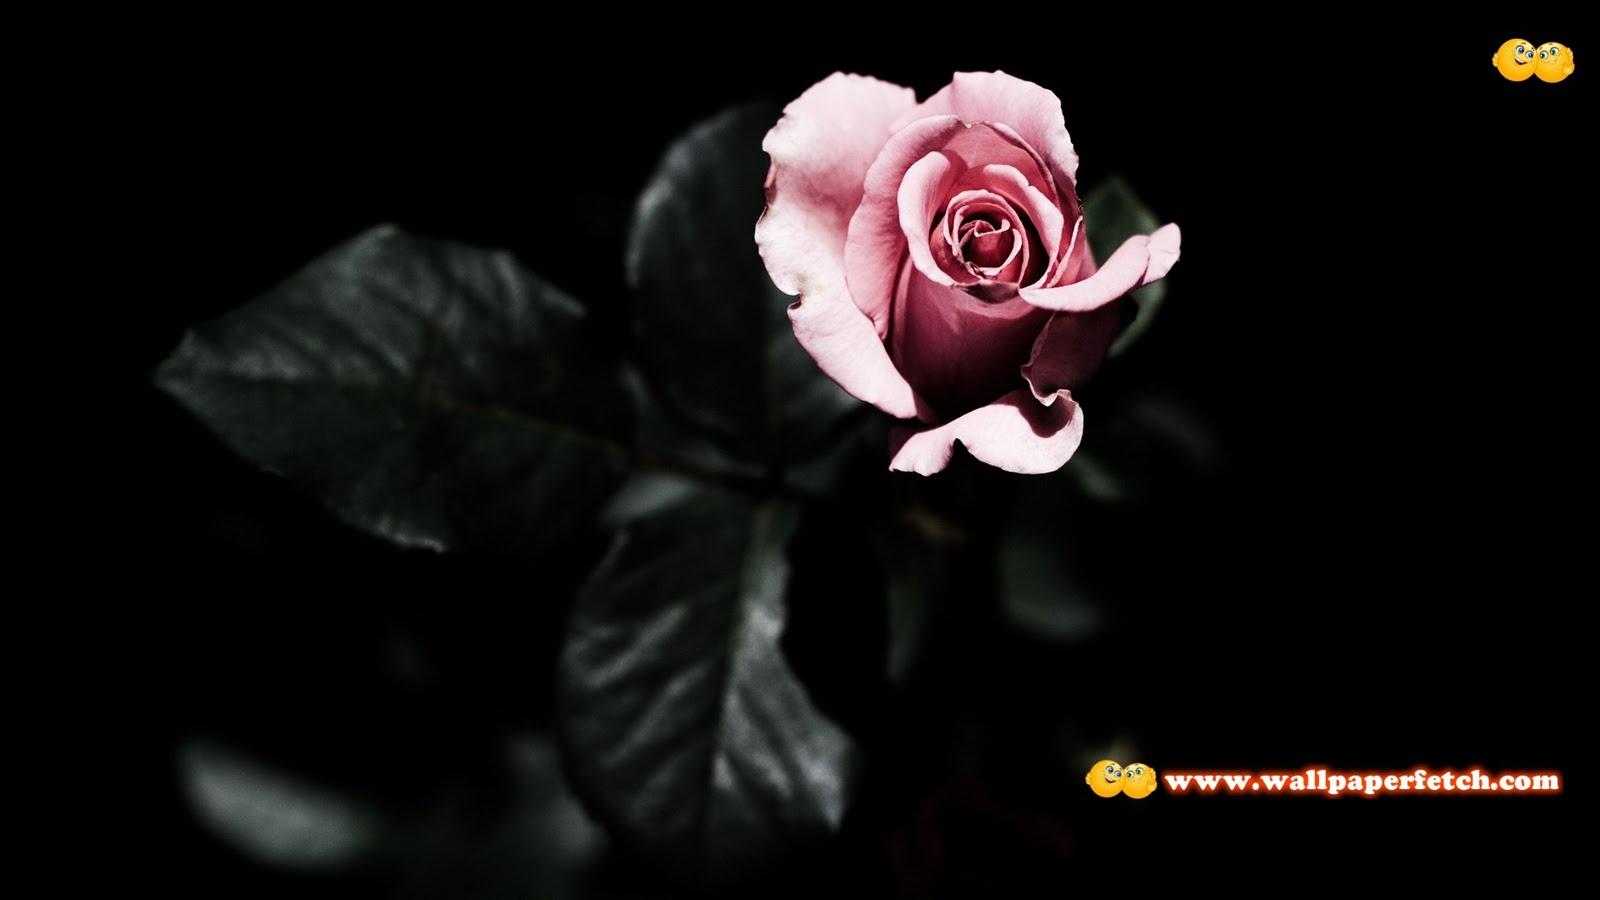 http://2.bp.blogspot.com/-C8aWG3st2Nw/TvTHdxYcvPI/AAAAAAAADIs/FEpDXSydrOw/s1600/HDPackSuperiorWallpapers296_038.jpg